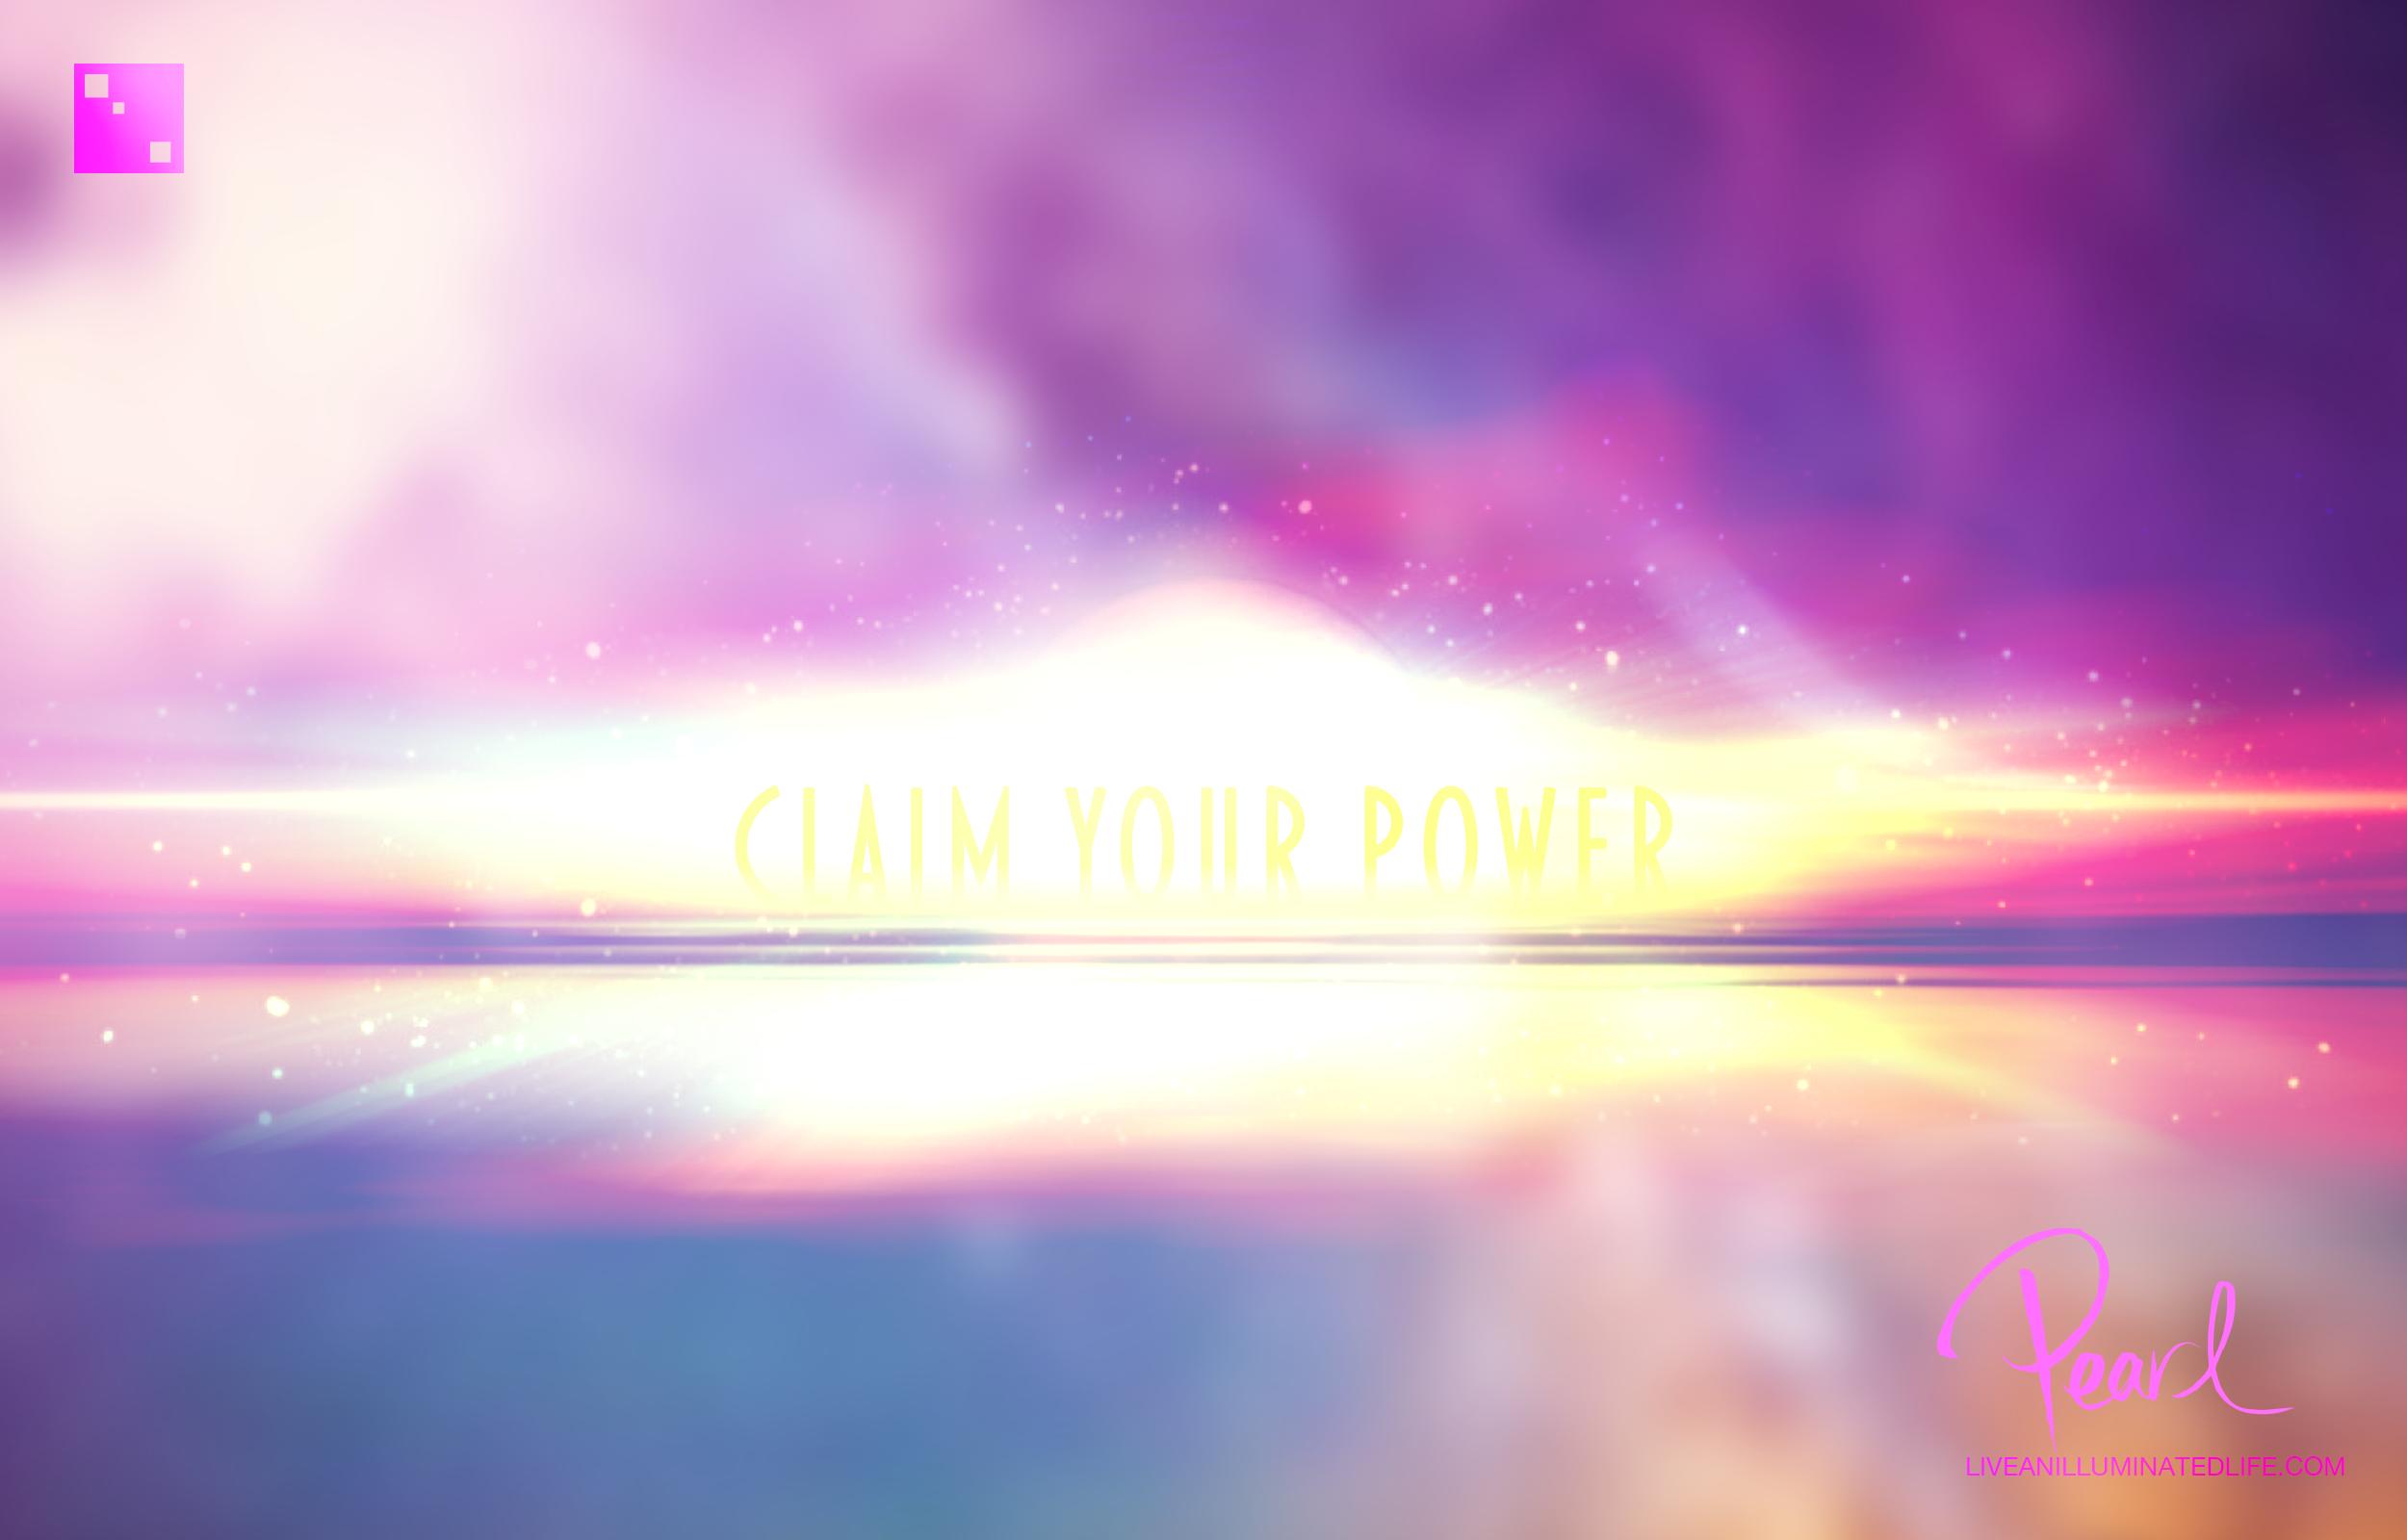 Full Moon Scorpio - Claim your Power